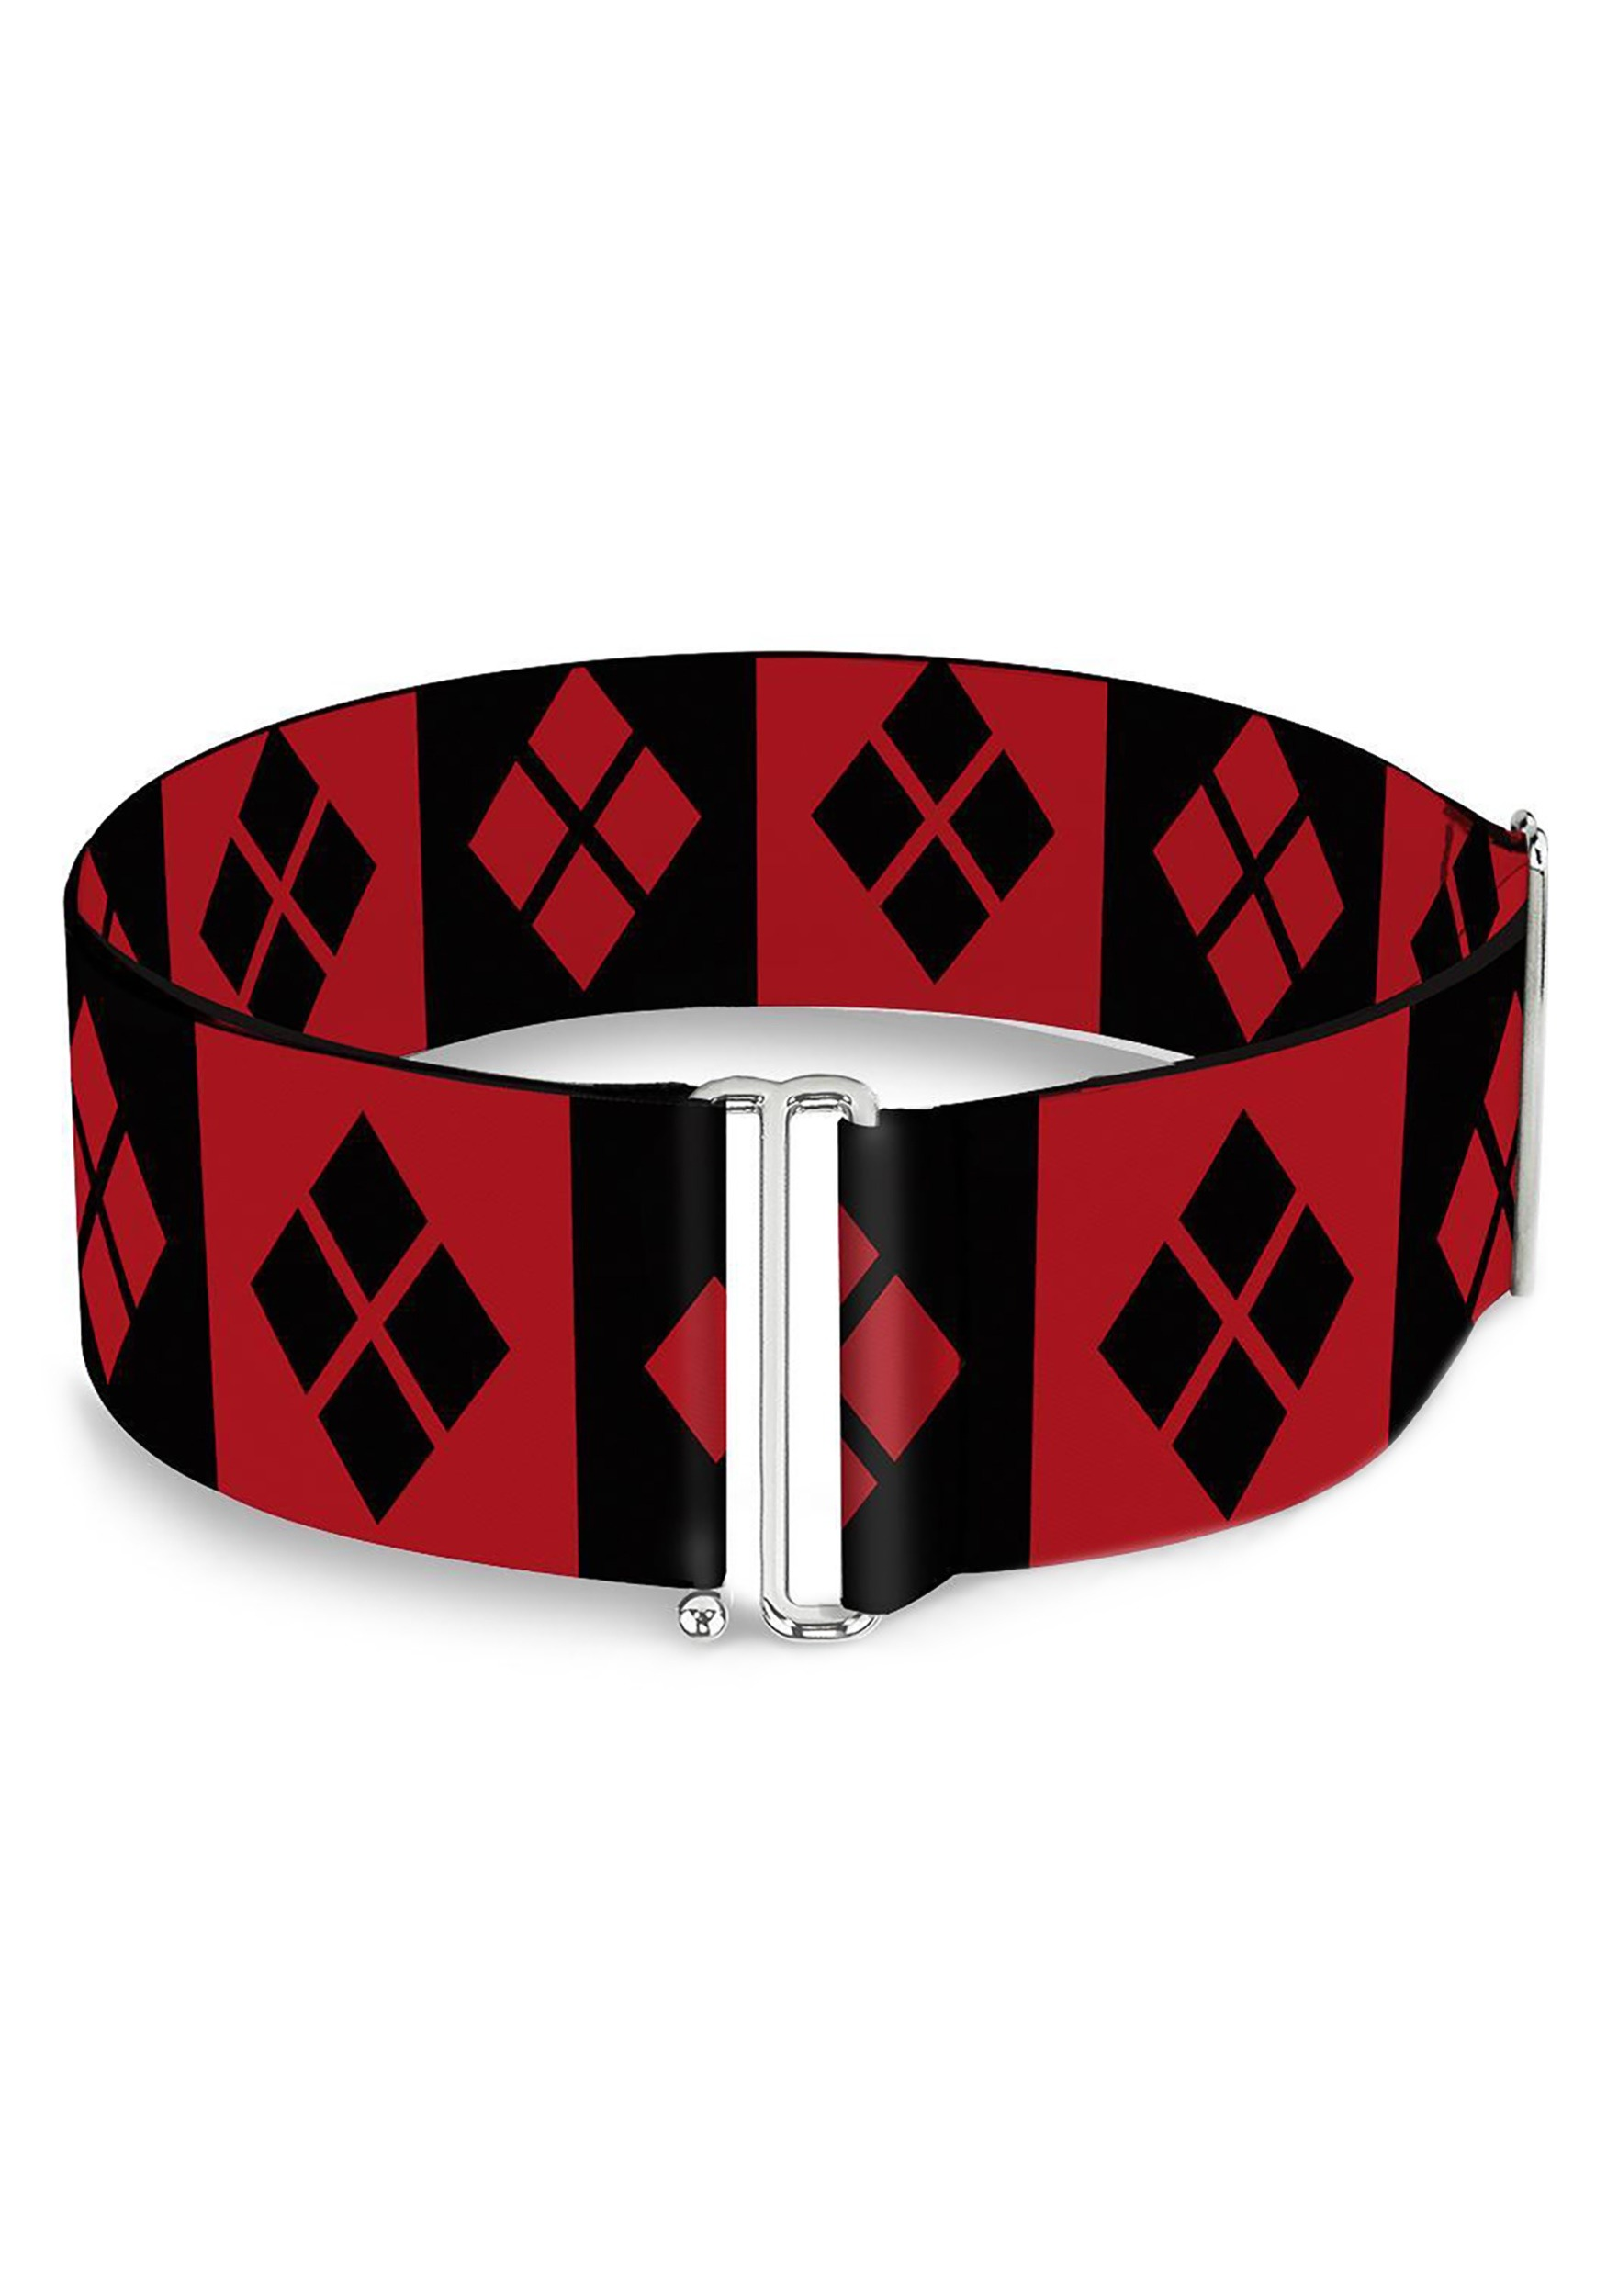 Harley_Quinn_Diamonds_RedBlack_Cinch_Waist_Belt